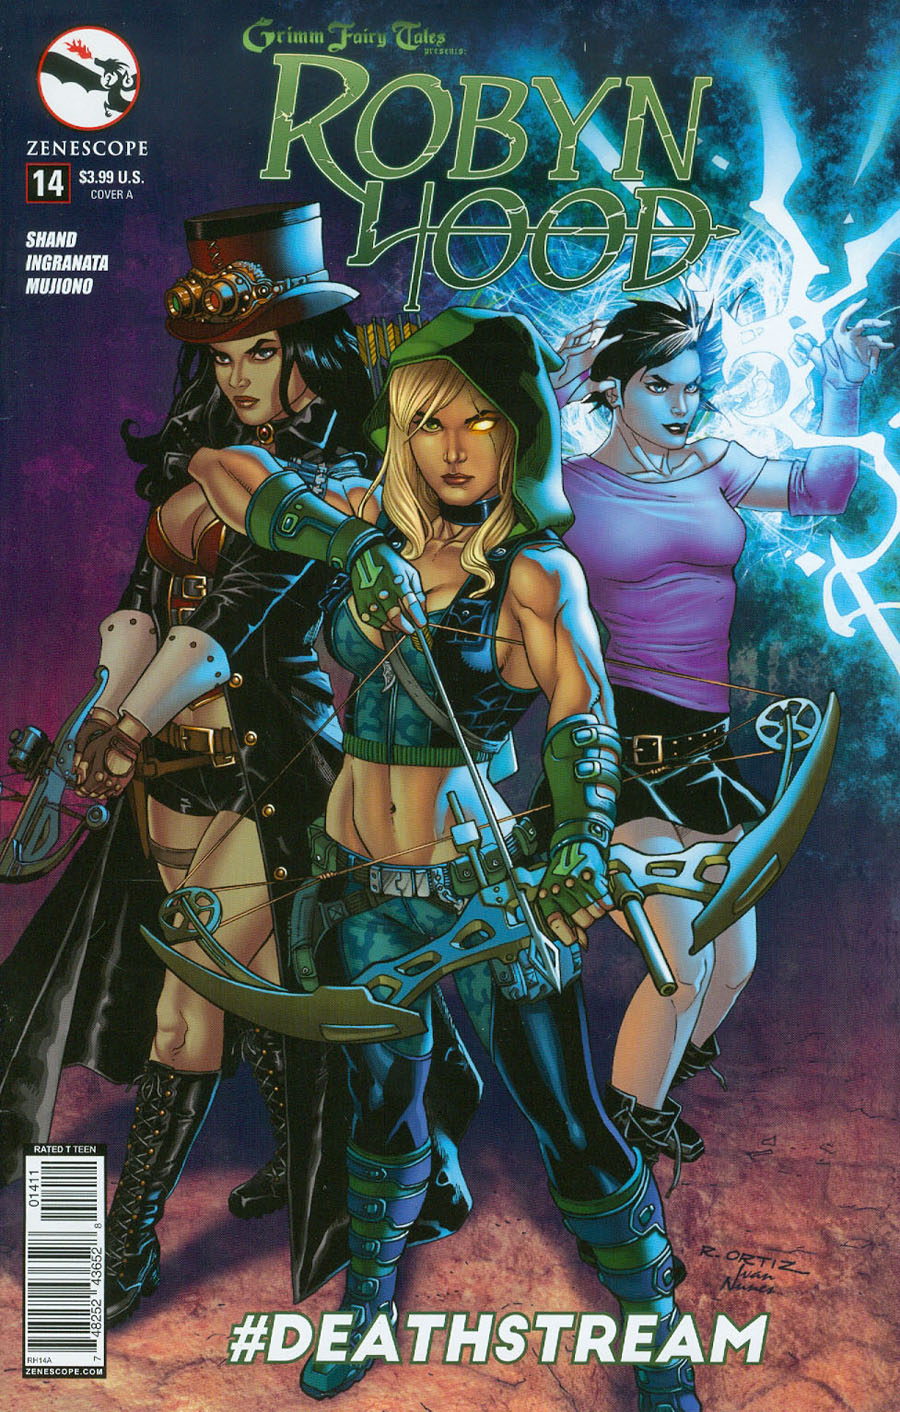 Grimm Fairy Tales Presents Robyn Hood Vol 2 #14 Cover A Richard Ortiz